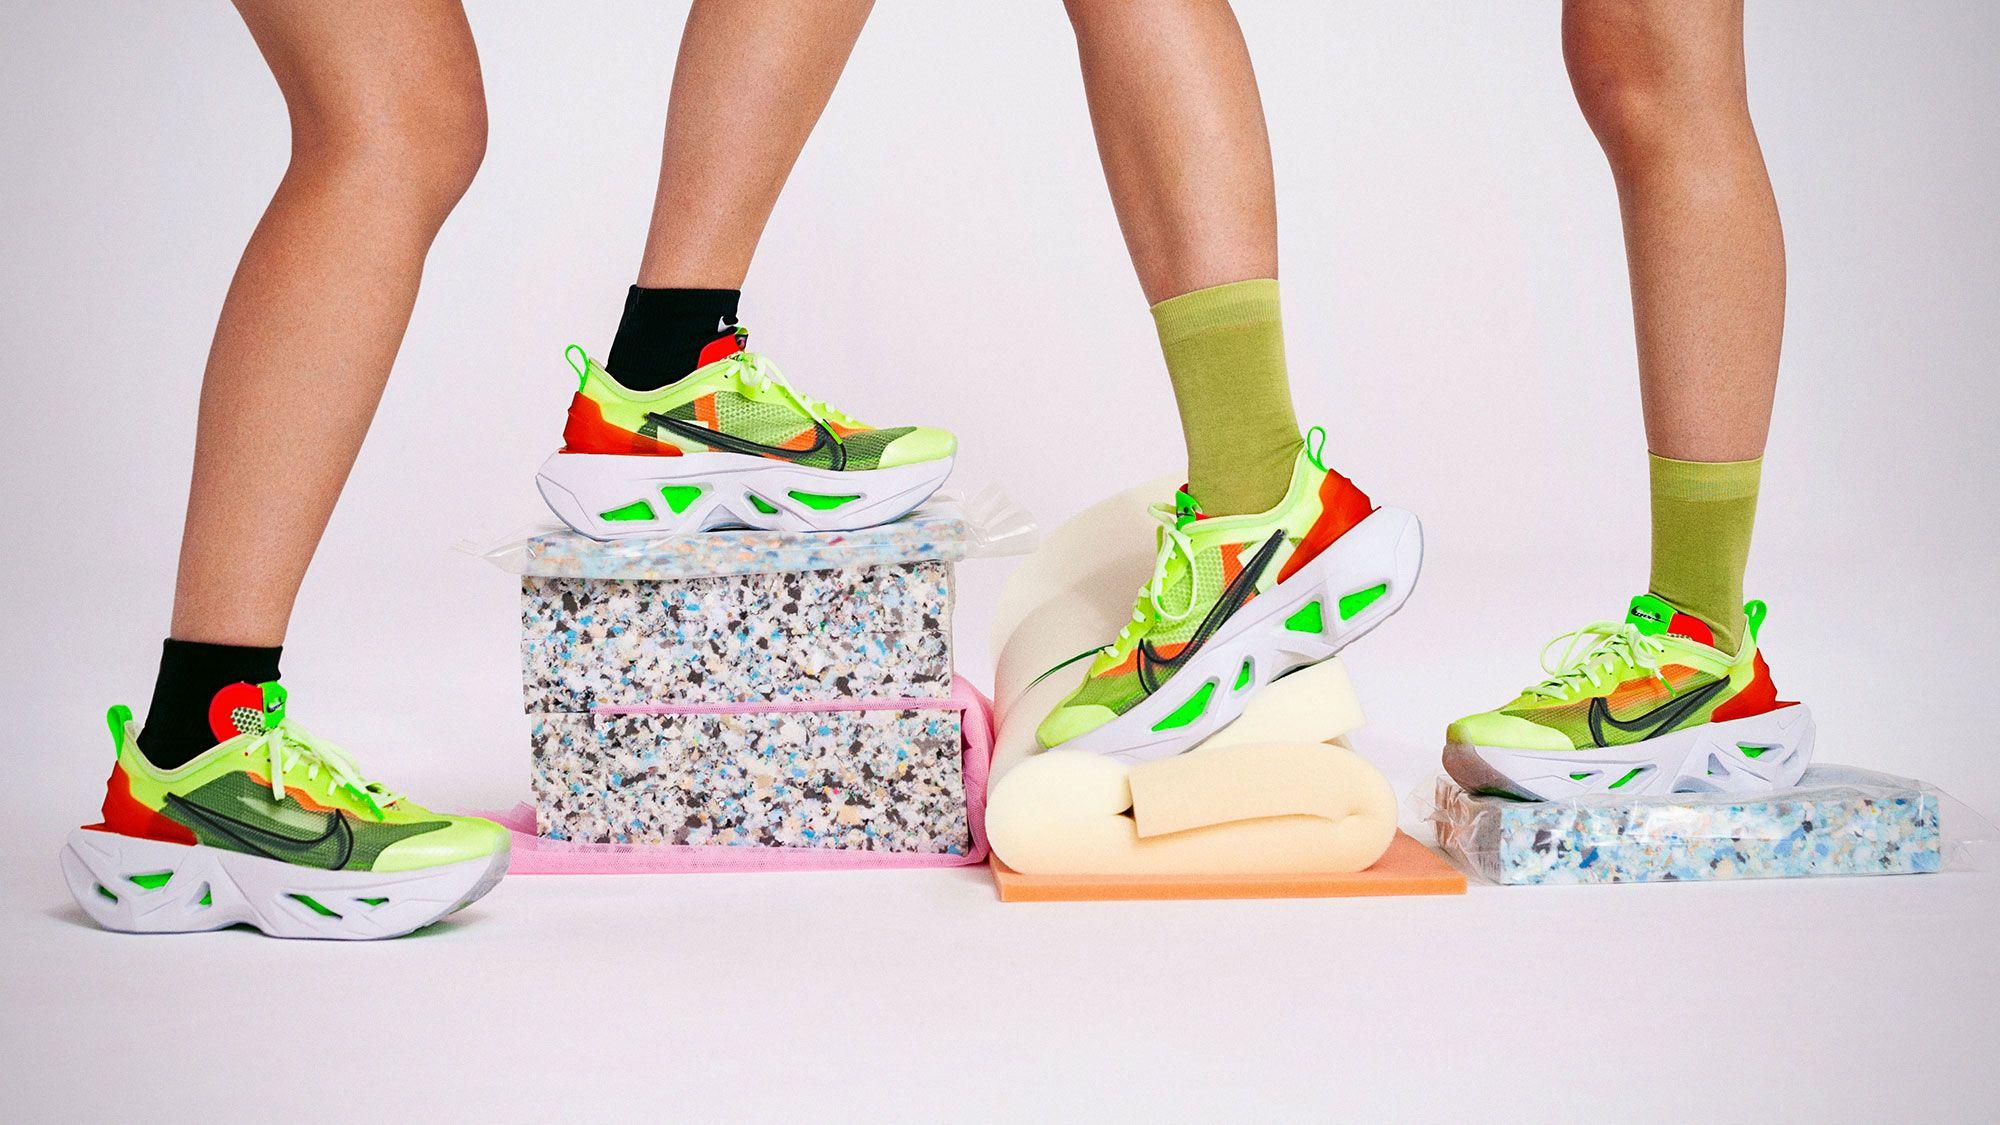 Nike Zoomx Vista Grind Sneakers Nike Metcon Shoe Releases Nike Air Monarch